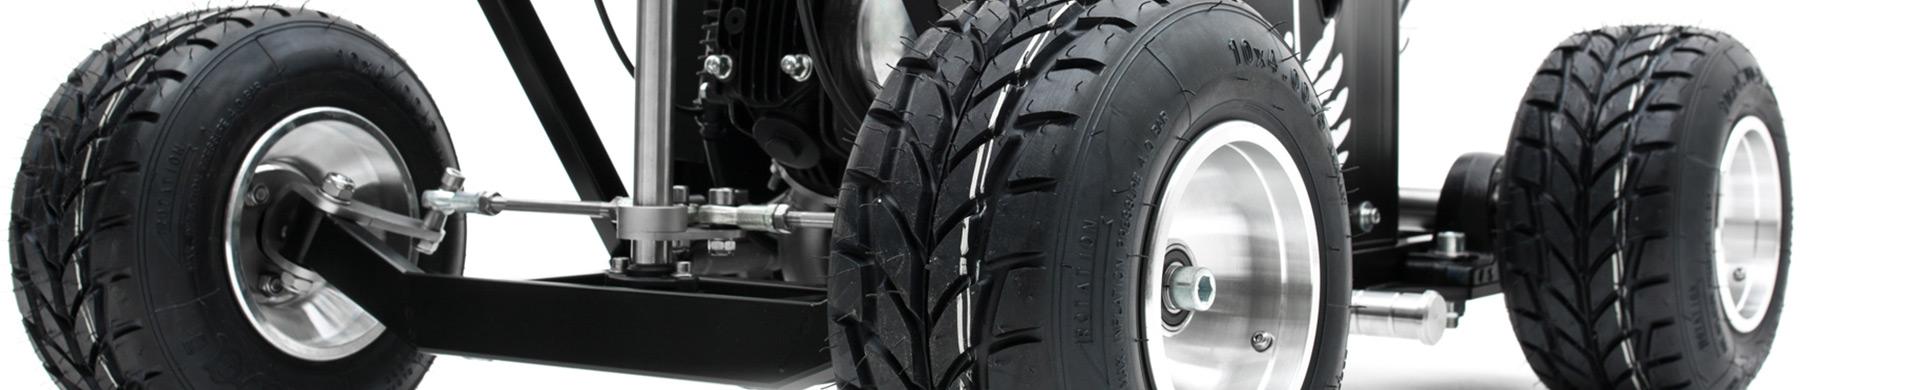 Felgen_Reifen_Kategorie